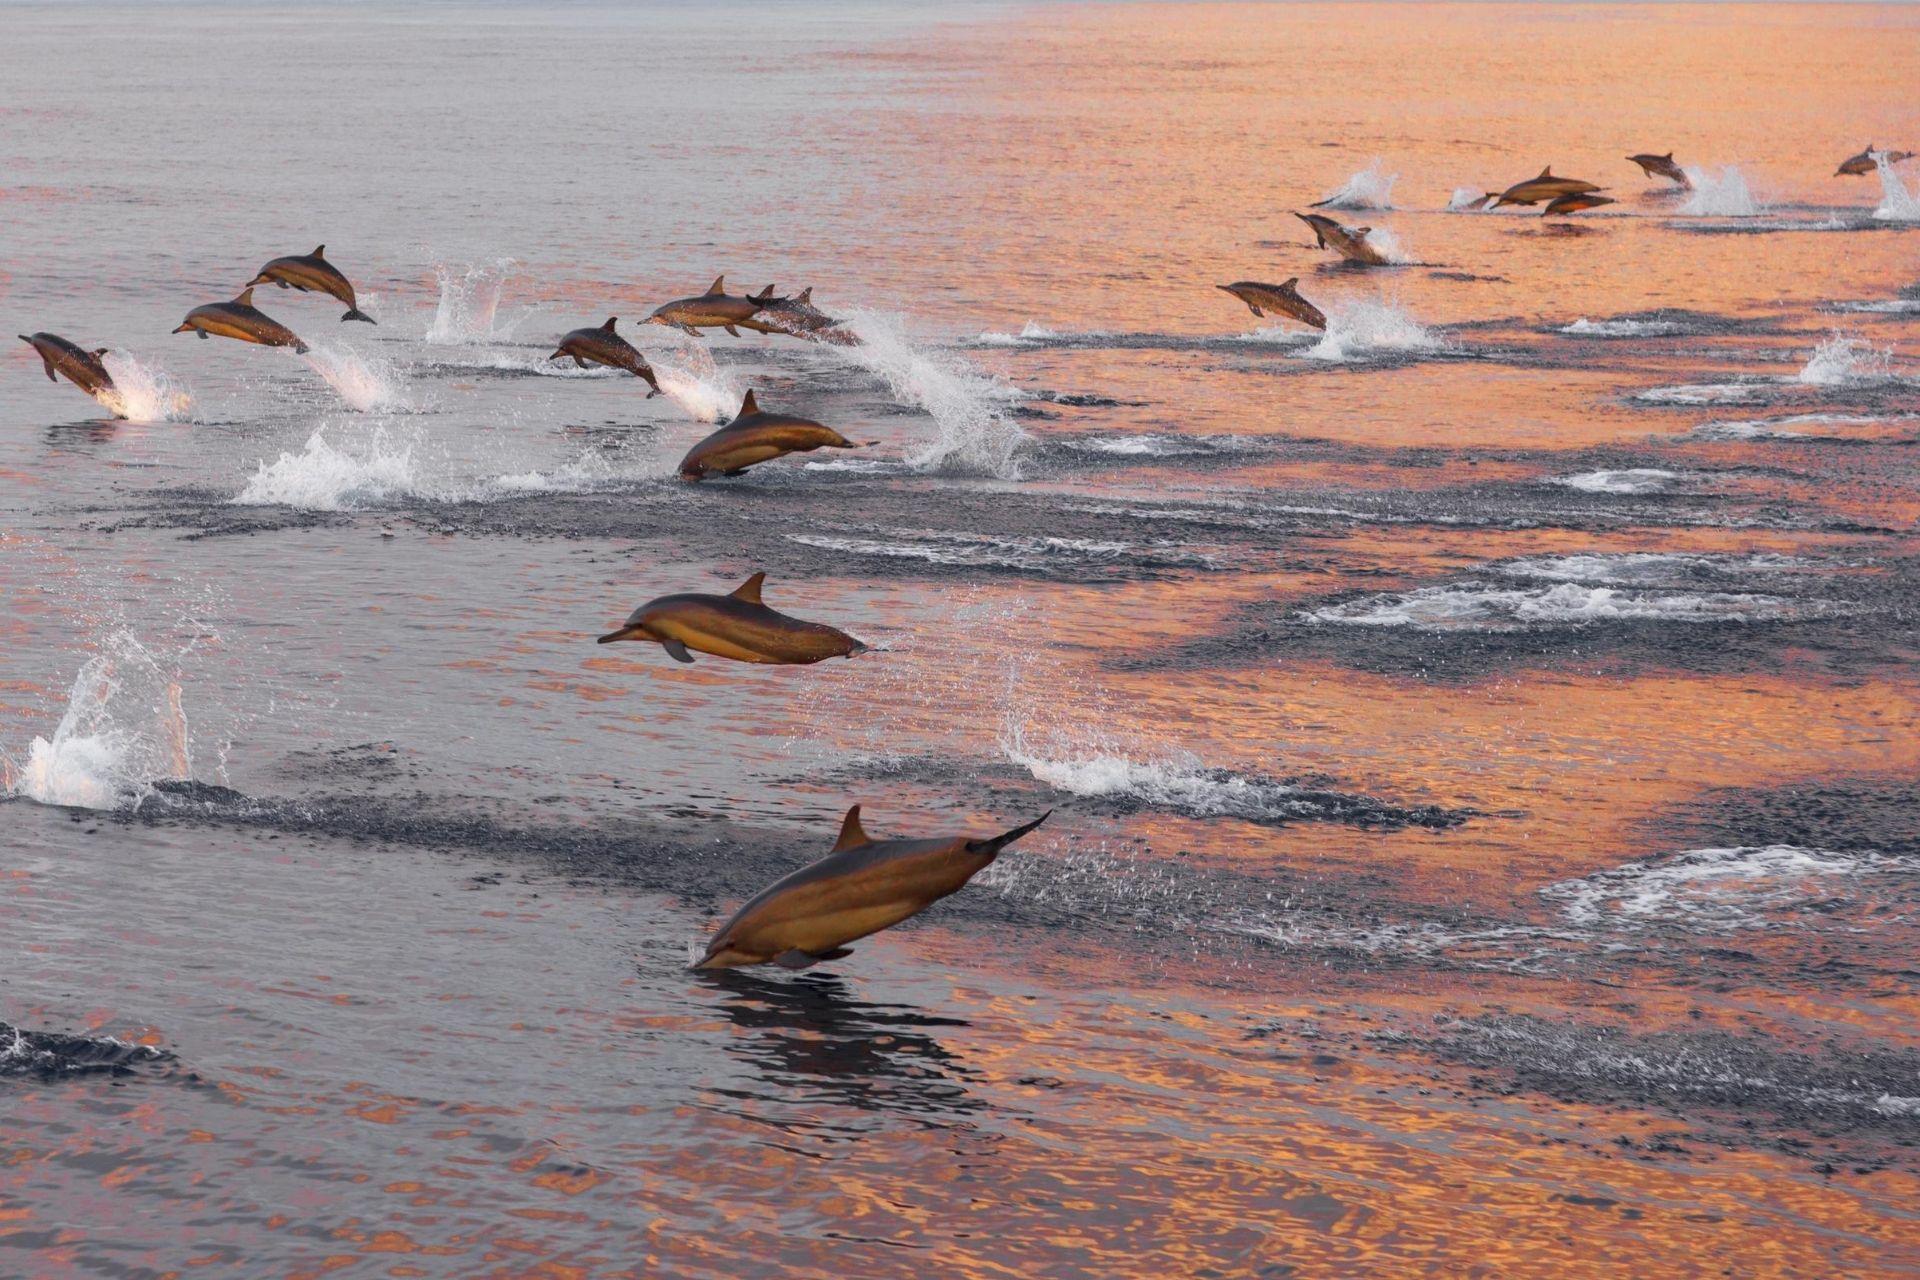 Maldives Sunset Dolphin Cruise Evening Trip